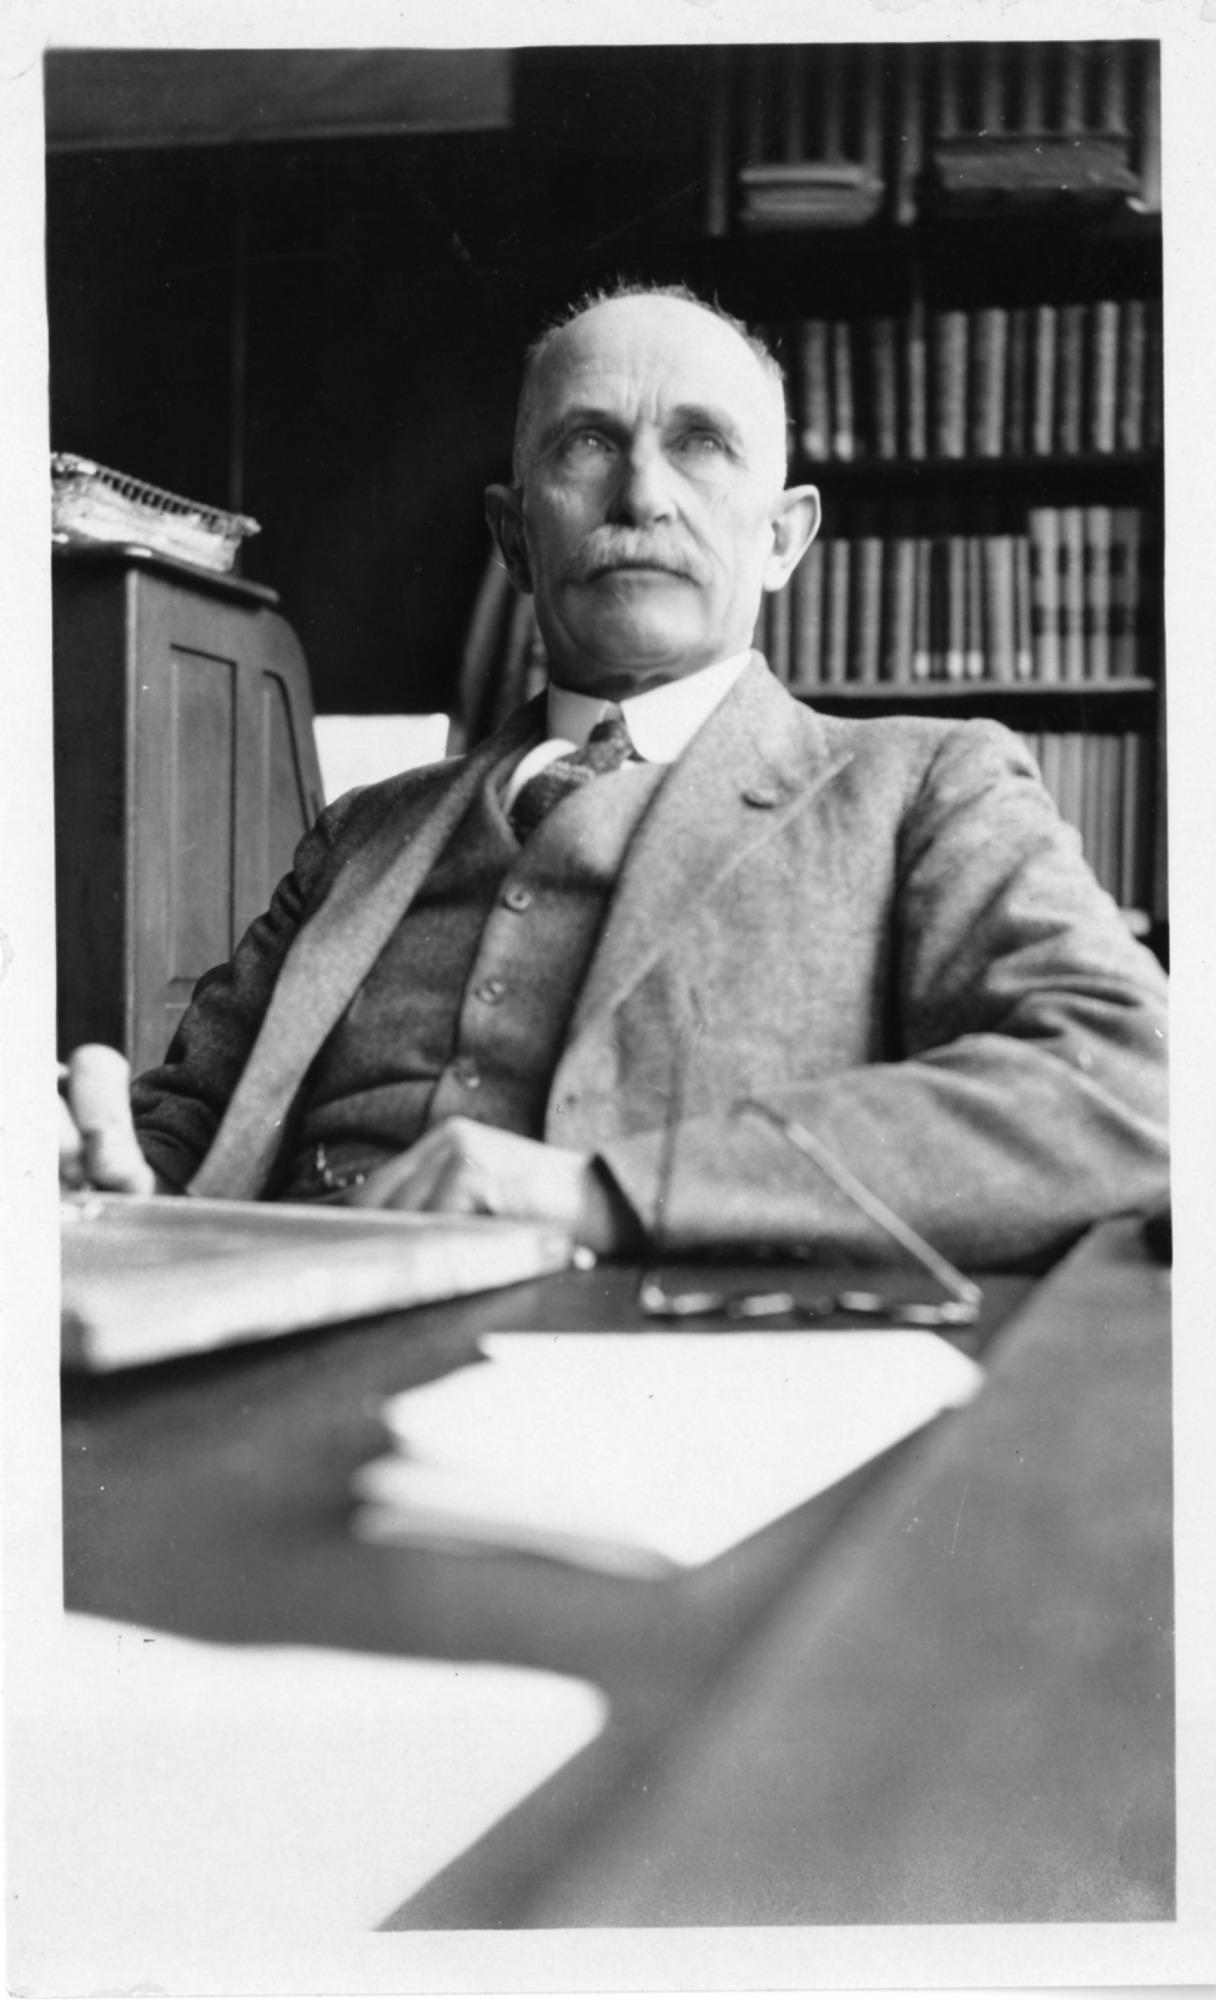 Allan Brooks (1869-1946), Smithsonian Institution Archives, SIA Acc. 90-105 [SIA2007-0384].